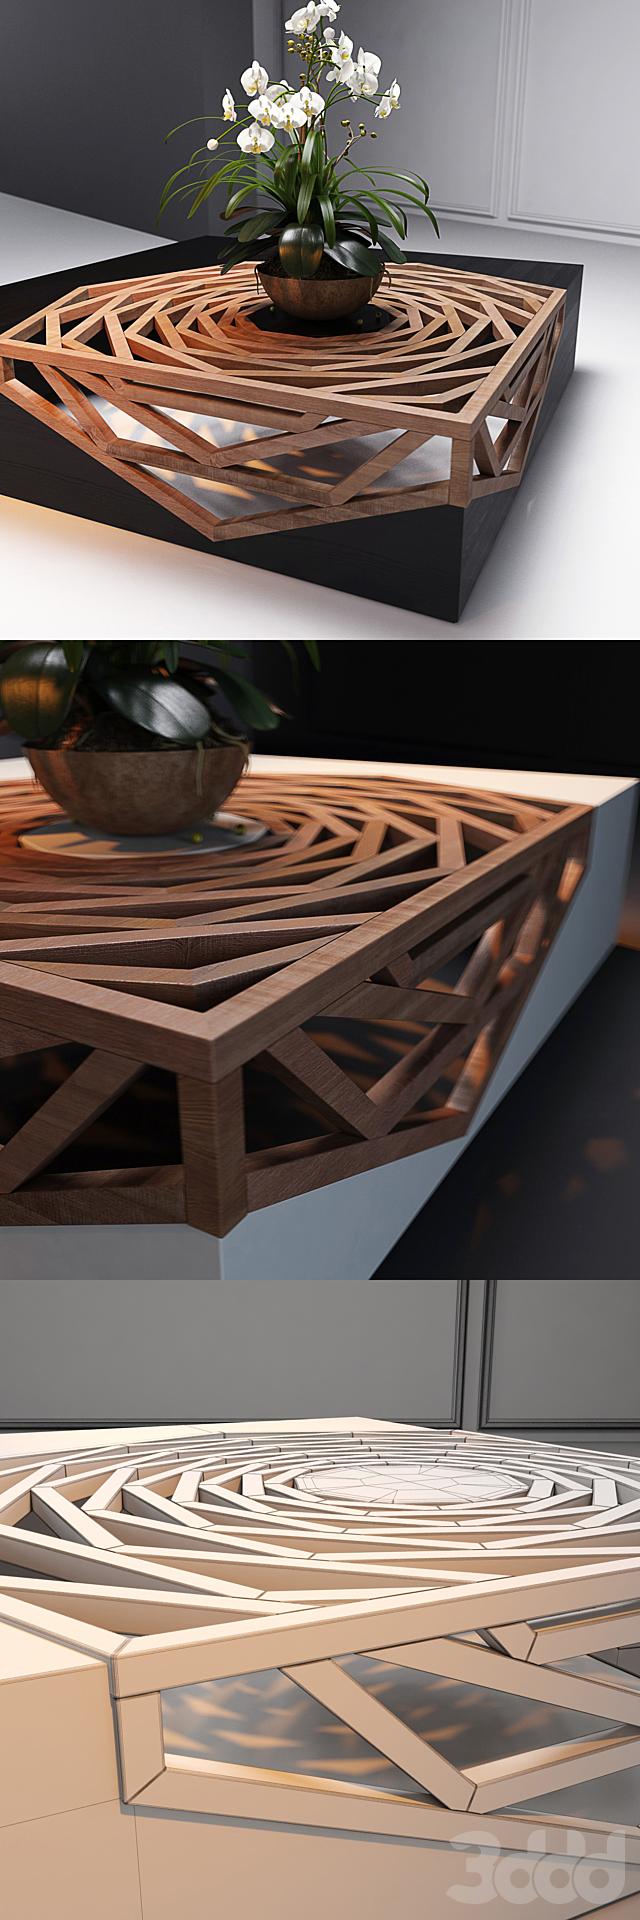 Hanako coffee table by Vito Selma